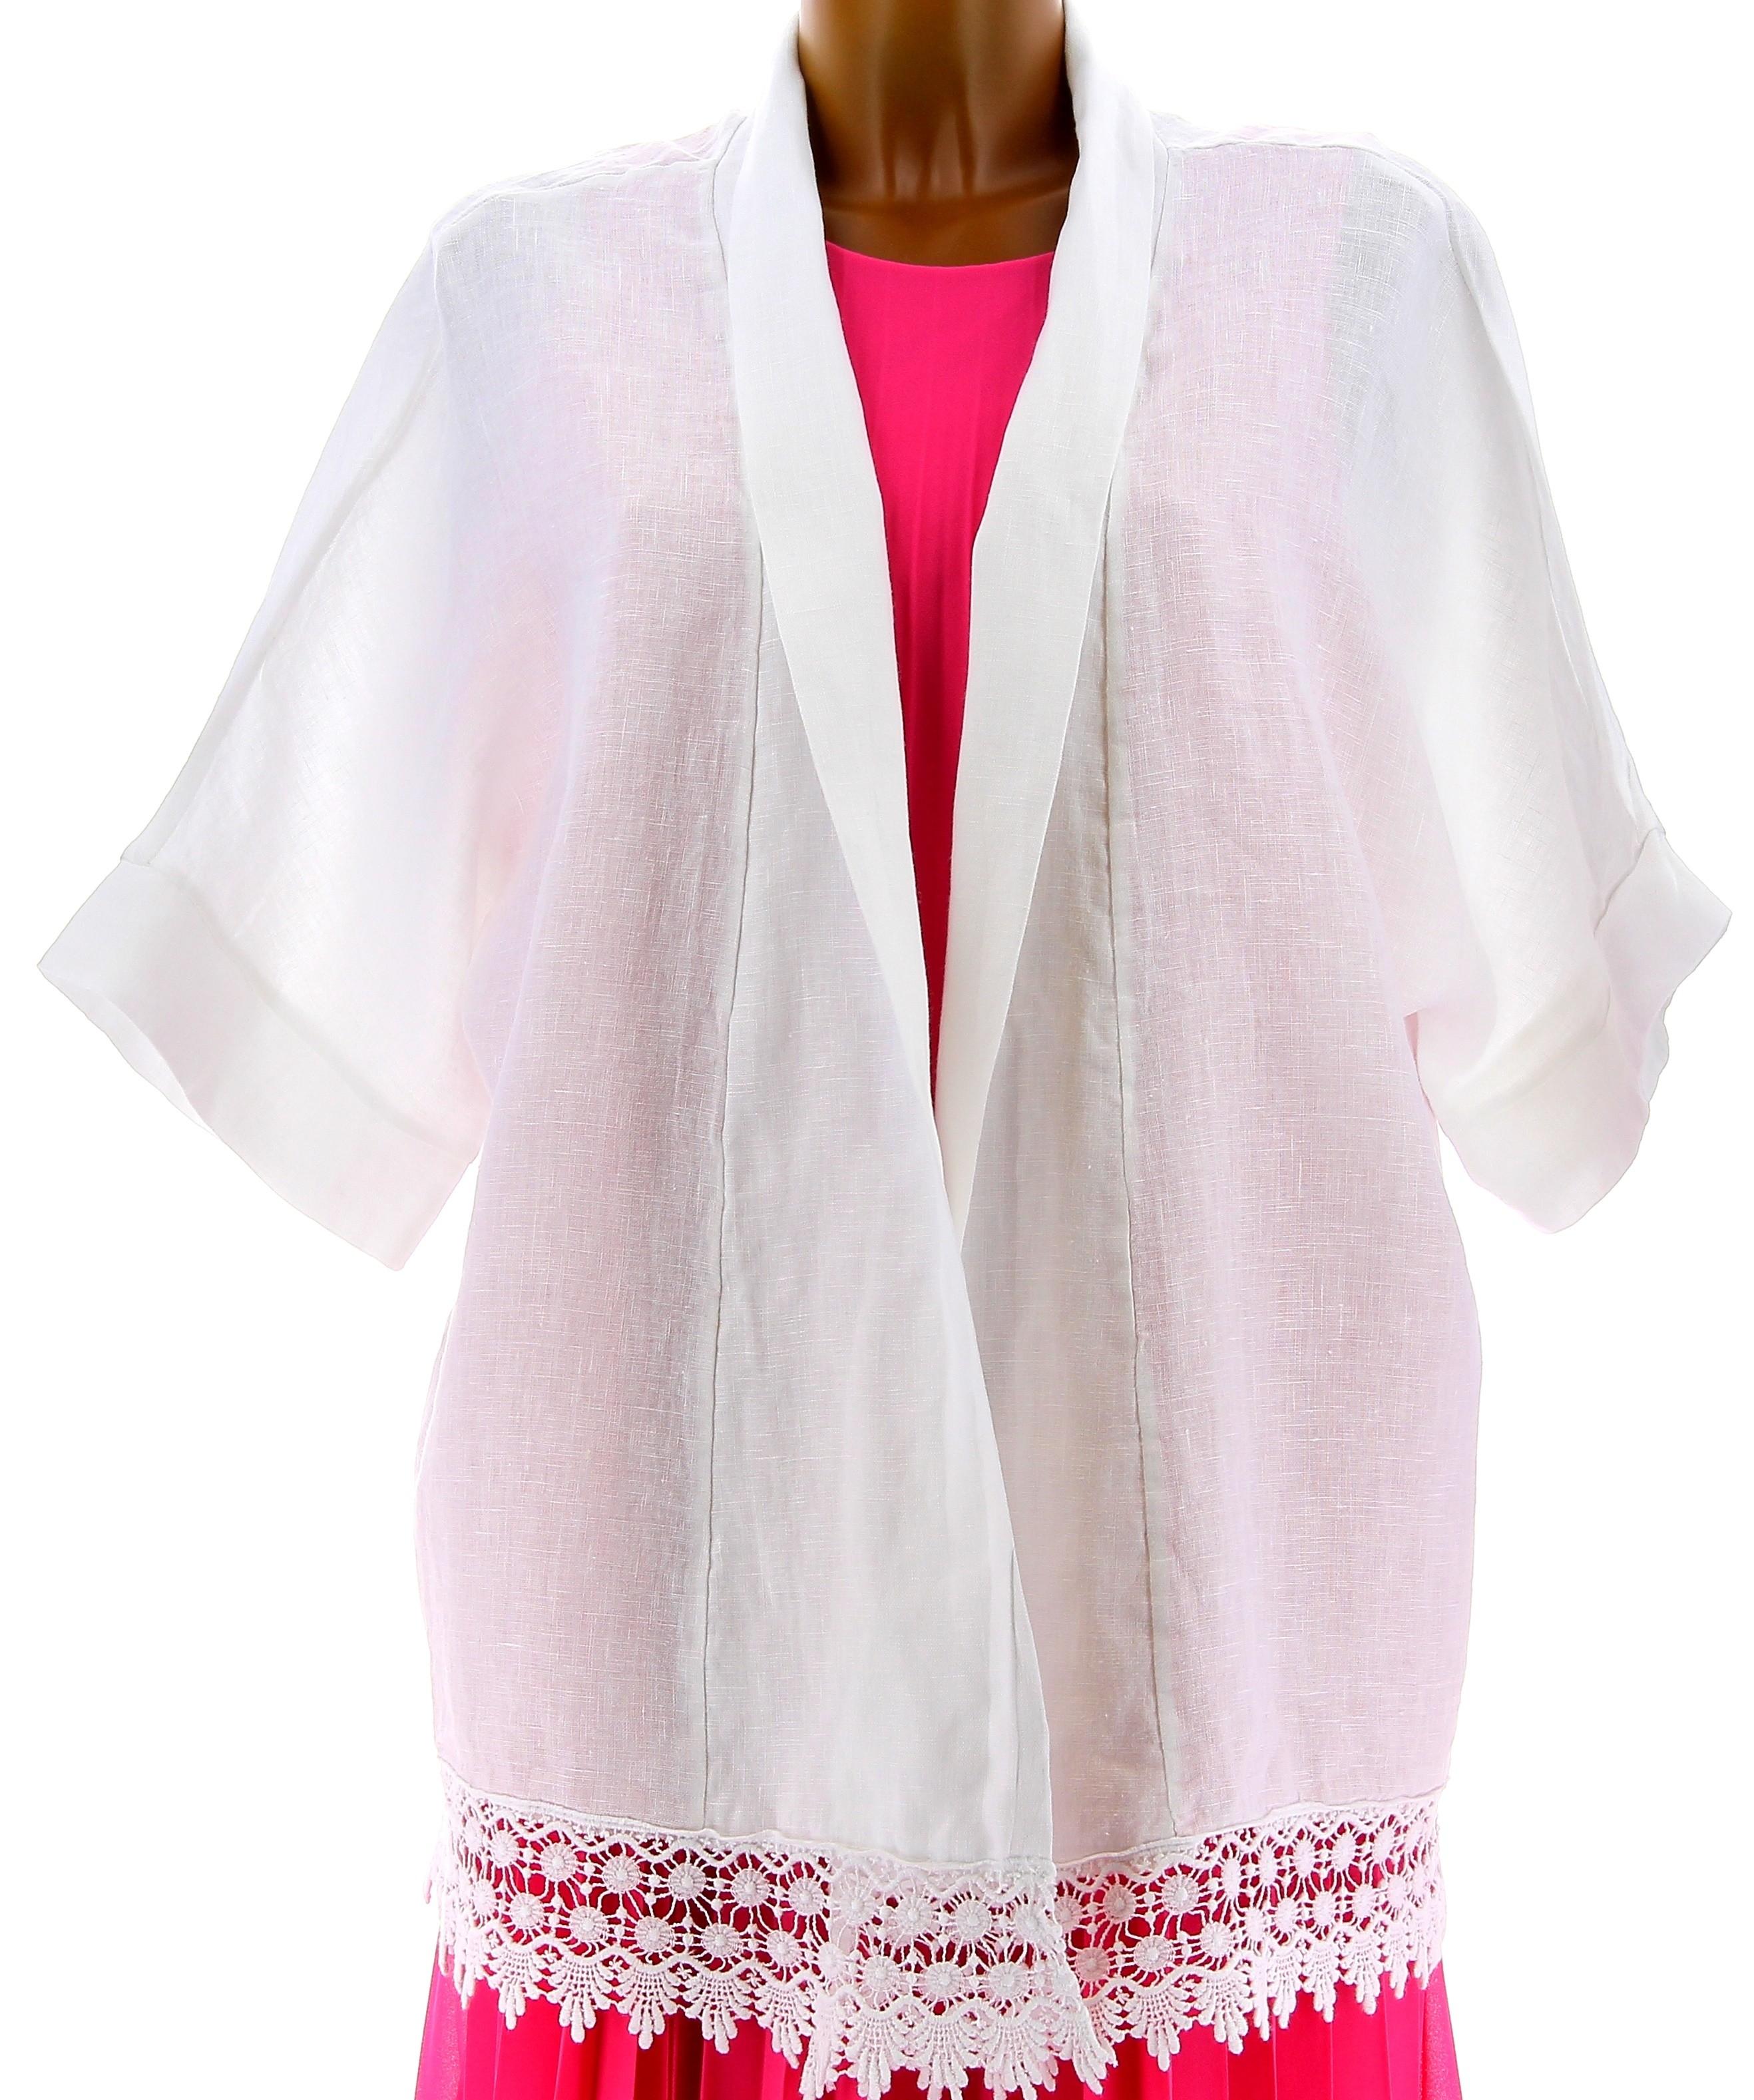 Veste blanc femme taille 46